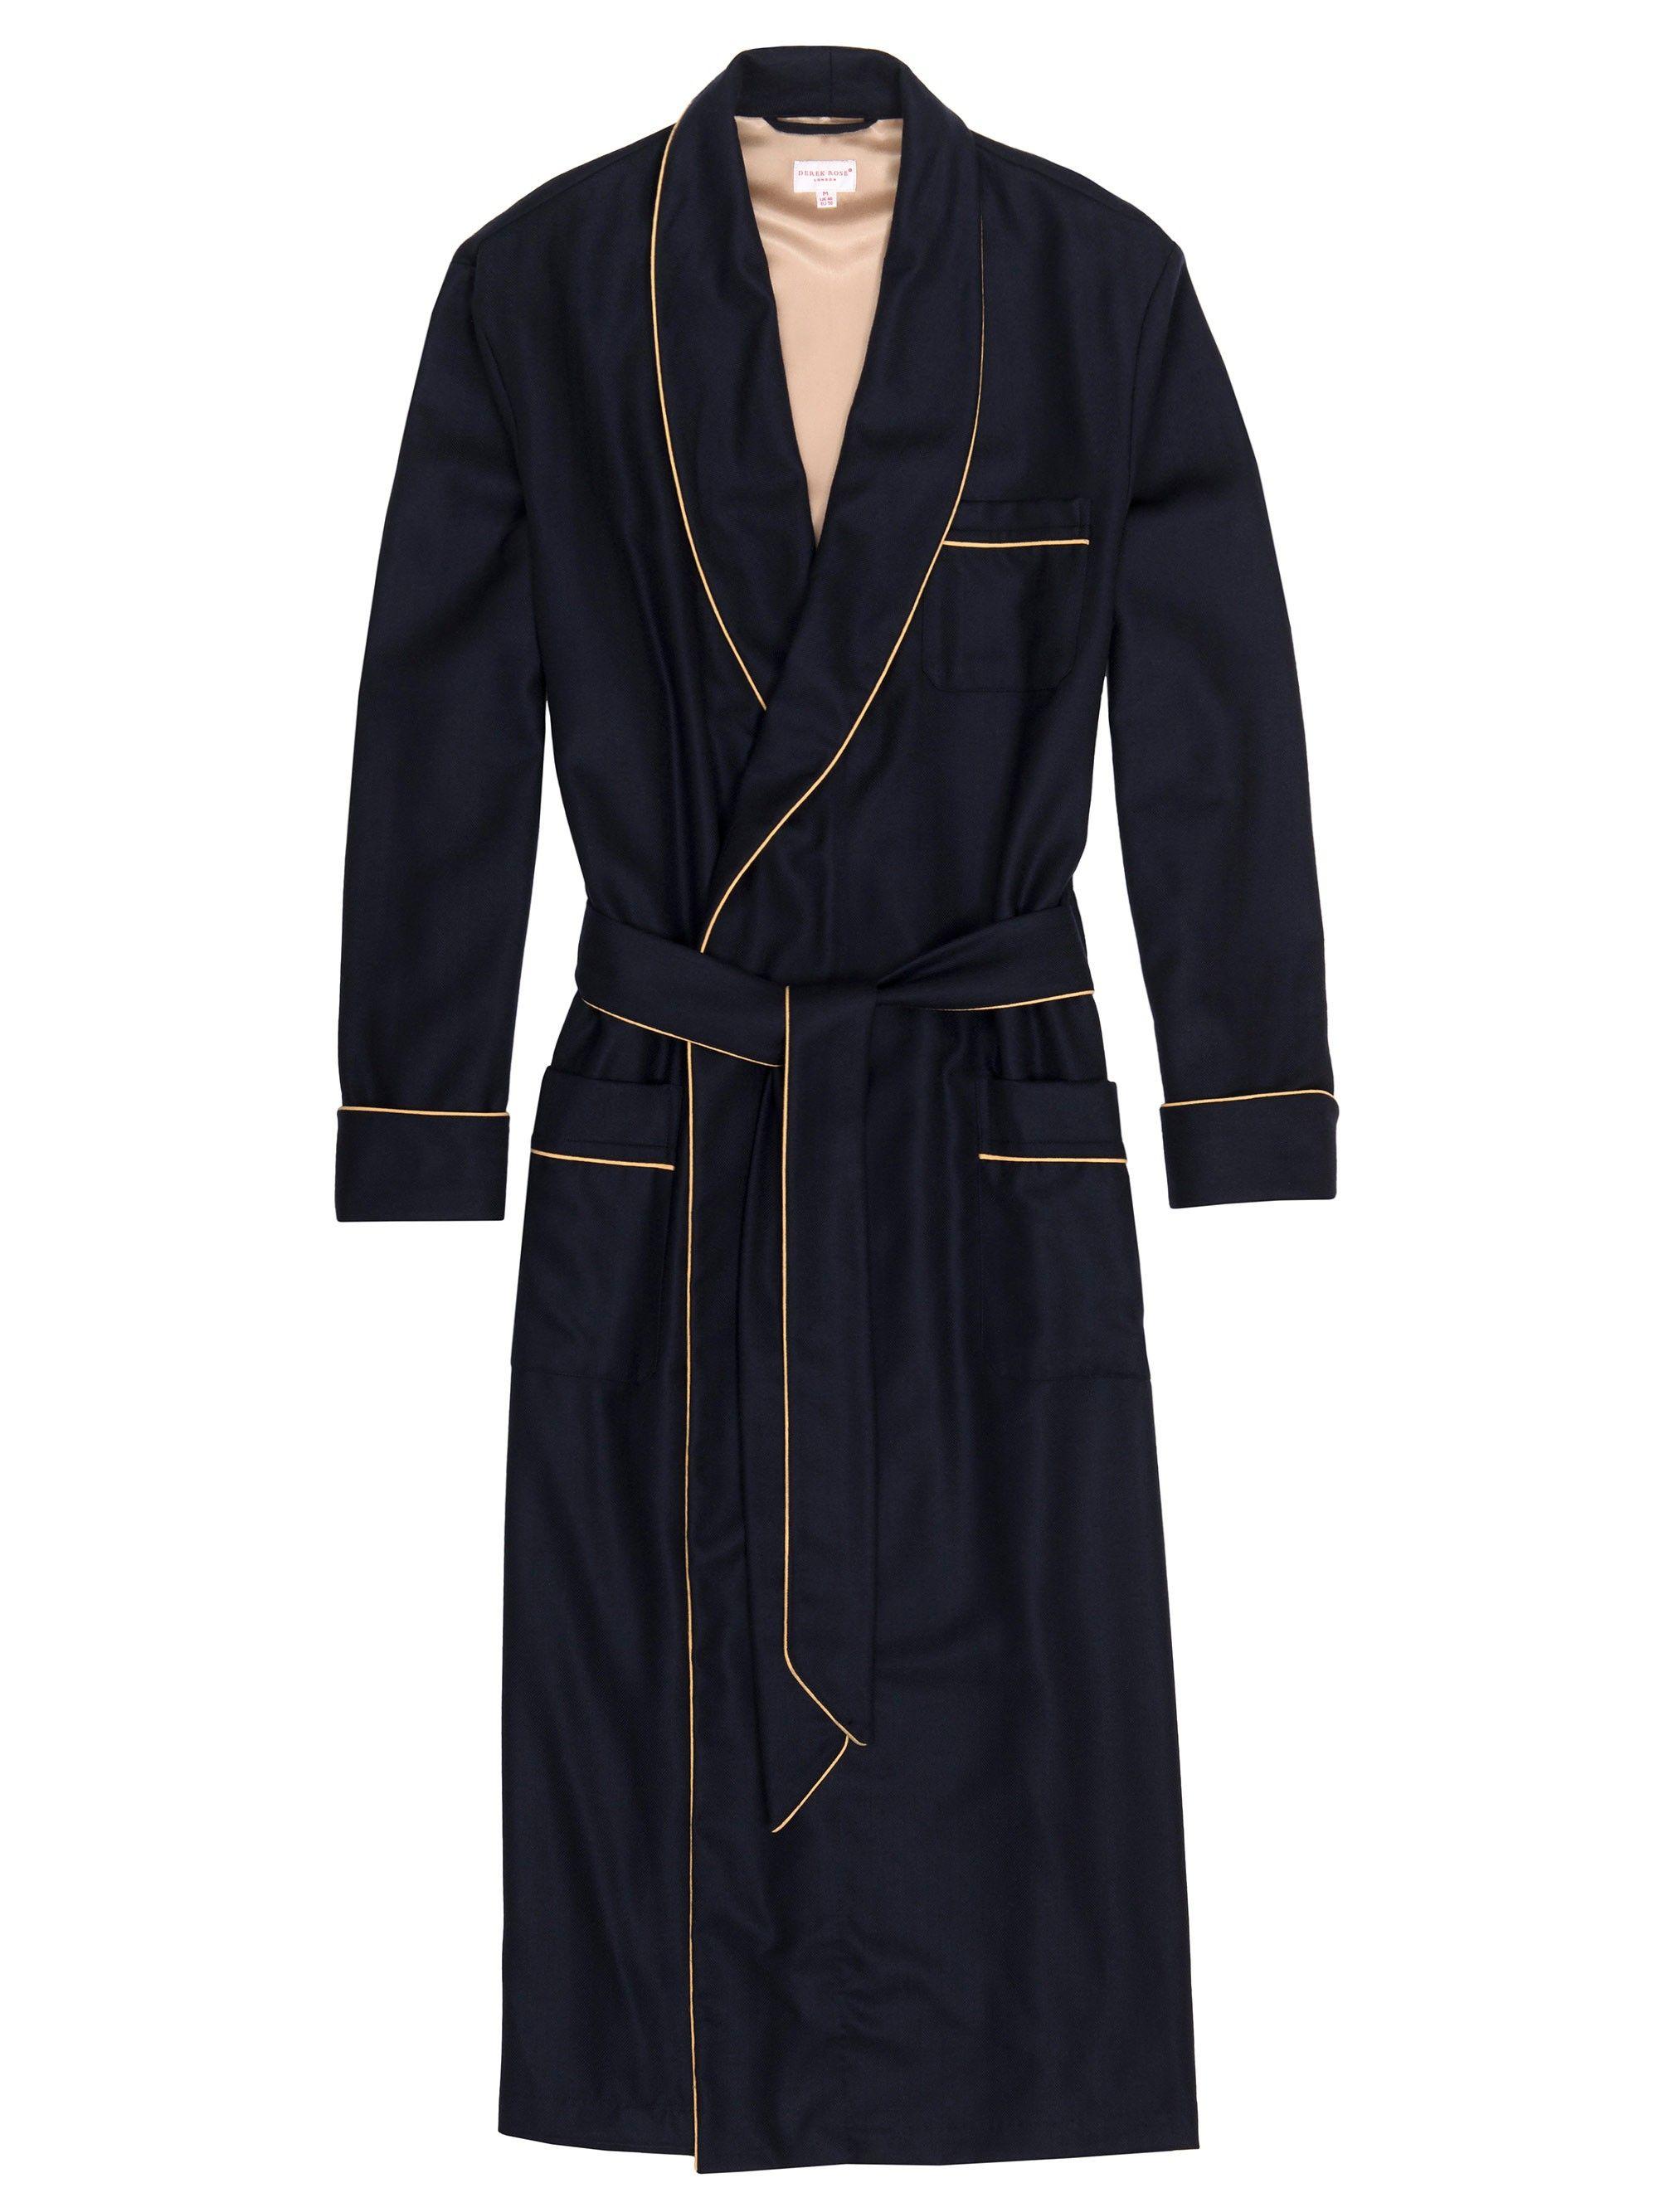 2ba8c48198 Men s Cashmere Dressing Gown - Duke Navy - Robes - Men s - Nightwear ...